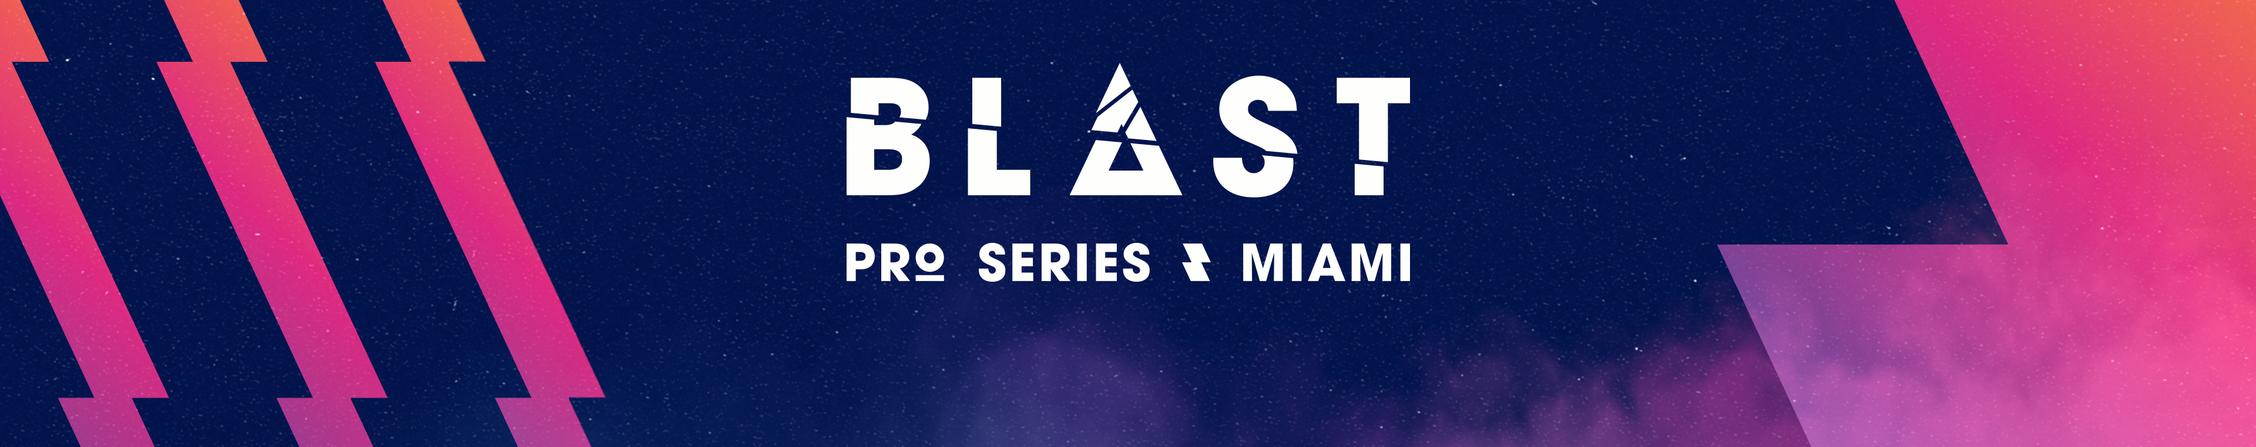 BLAST Pro Series: Miami 2019